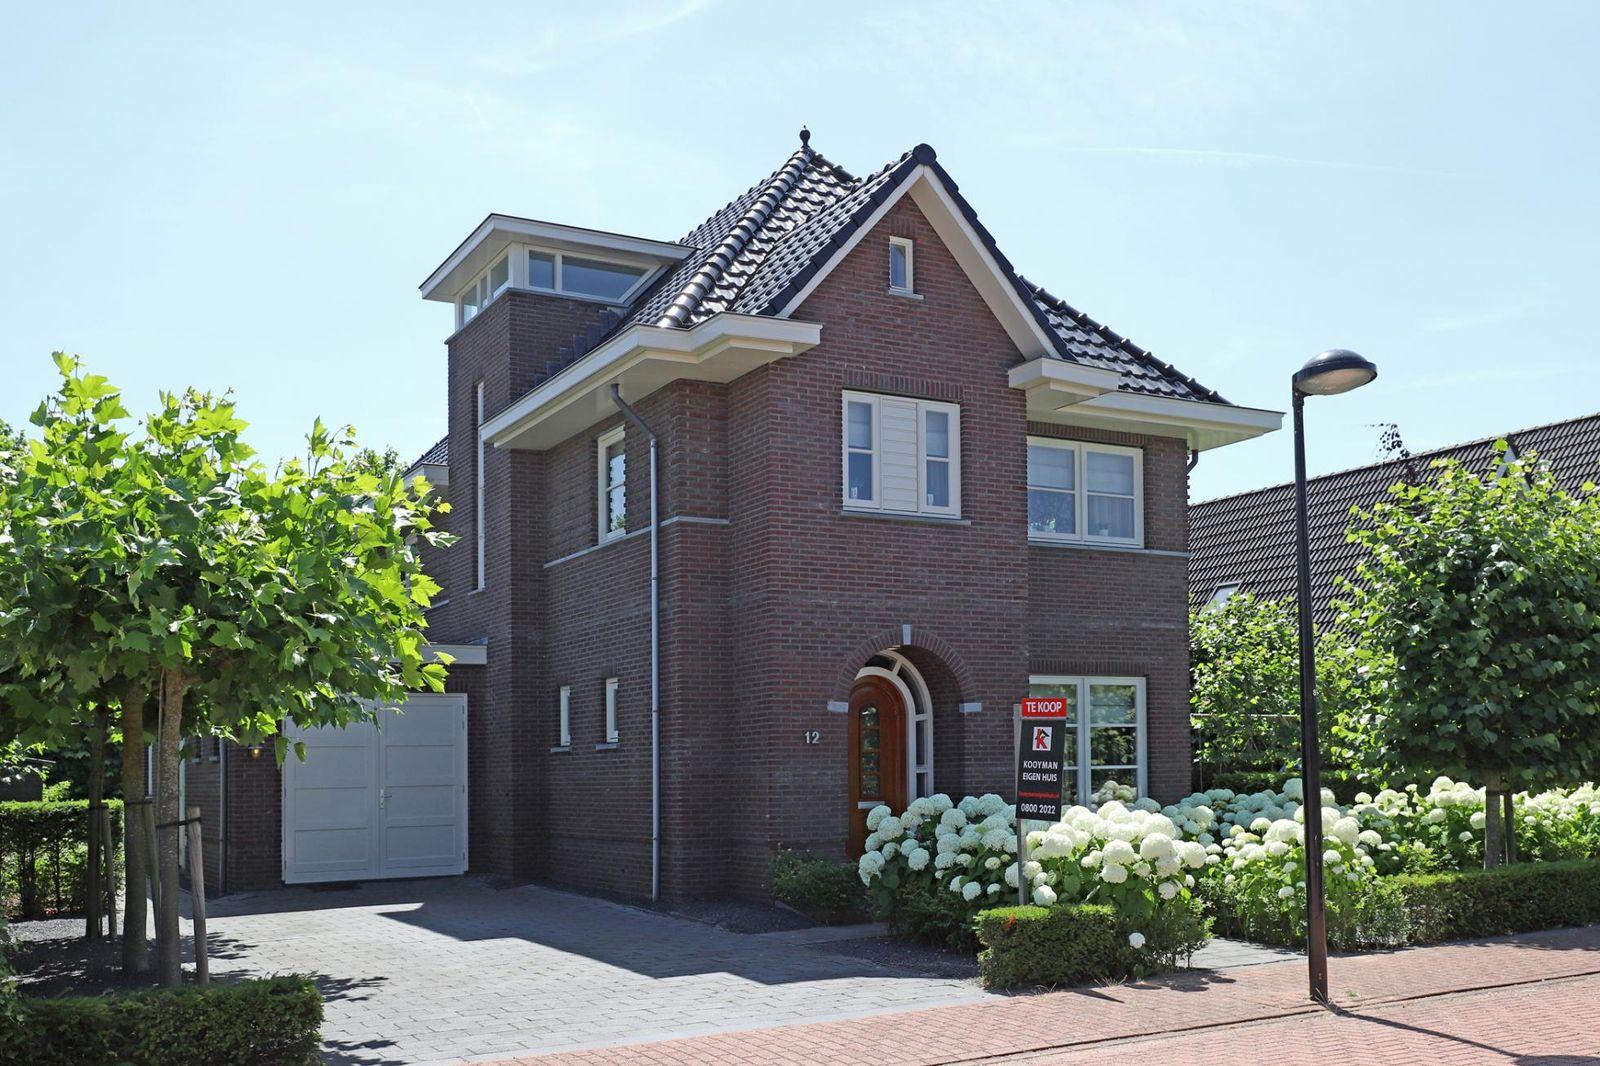 Emmertarwehof 12, Alblasserdam